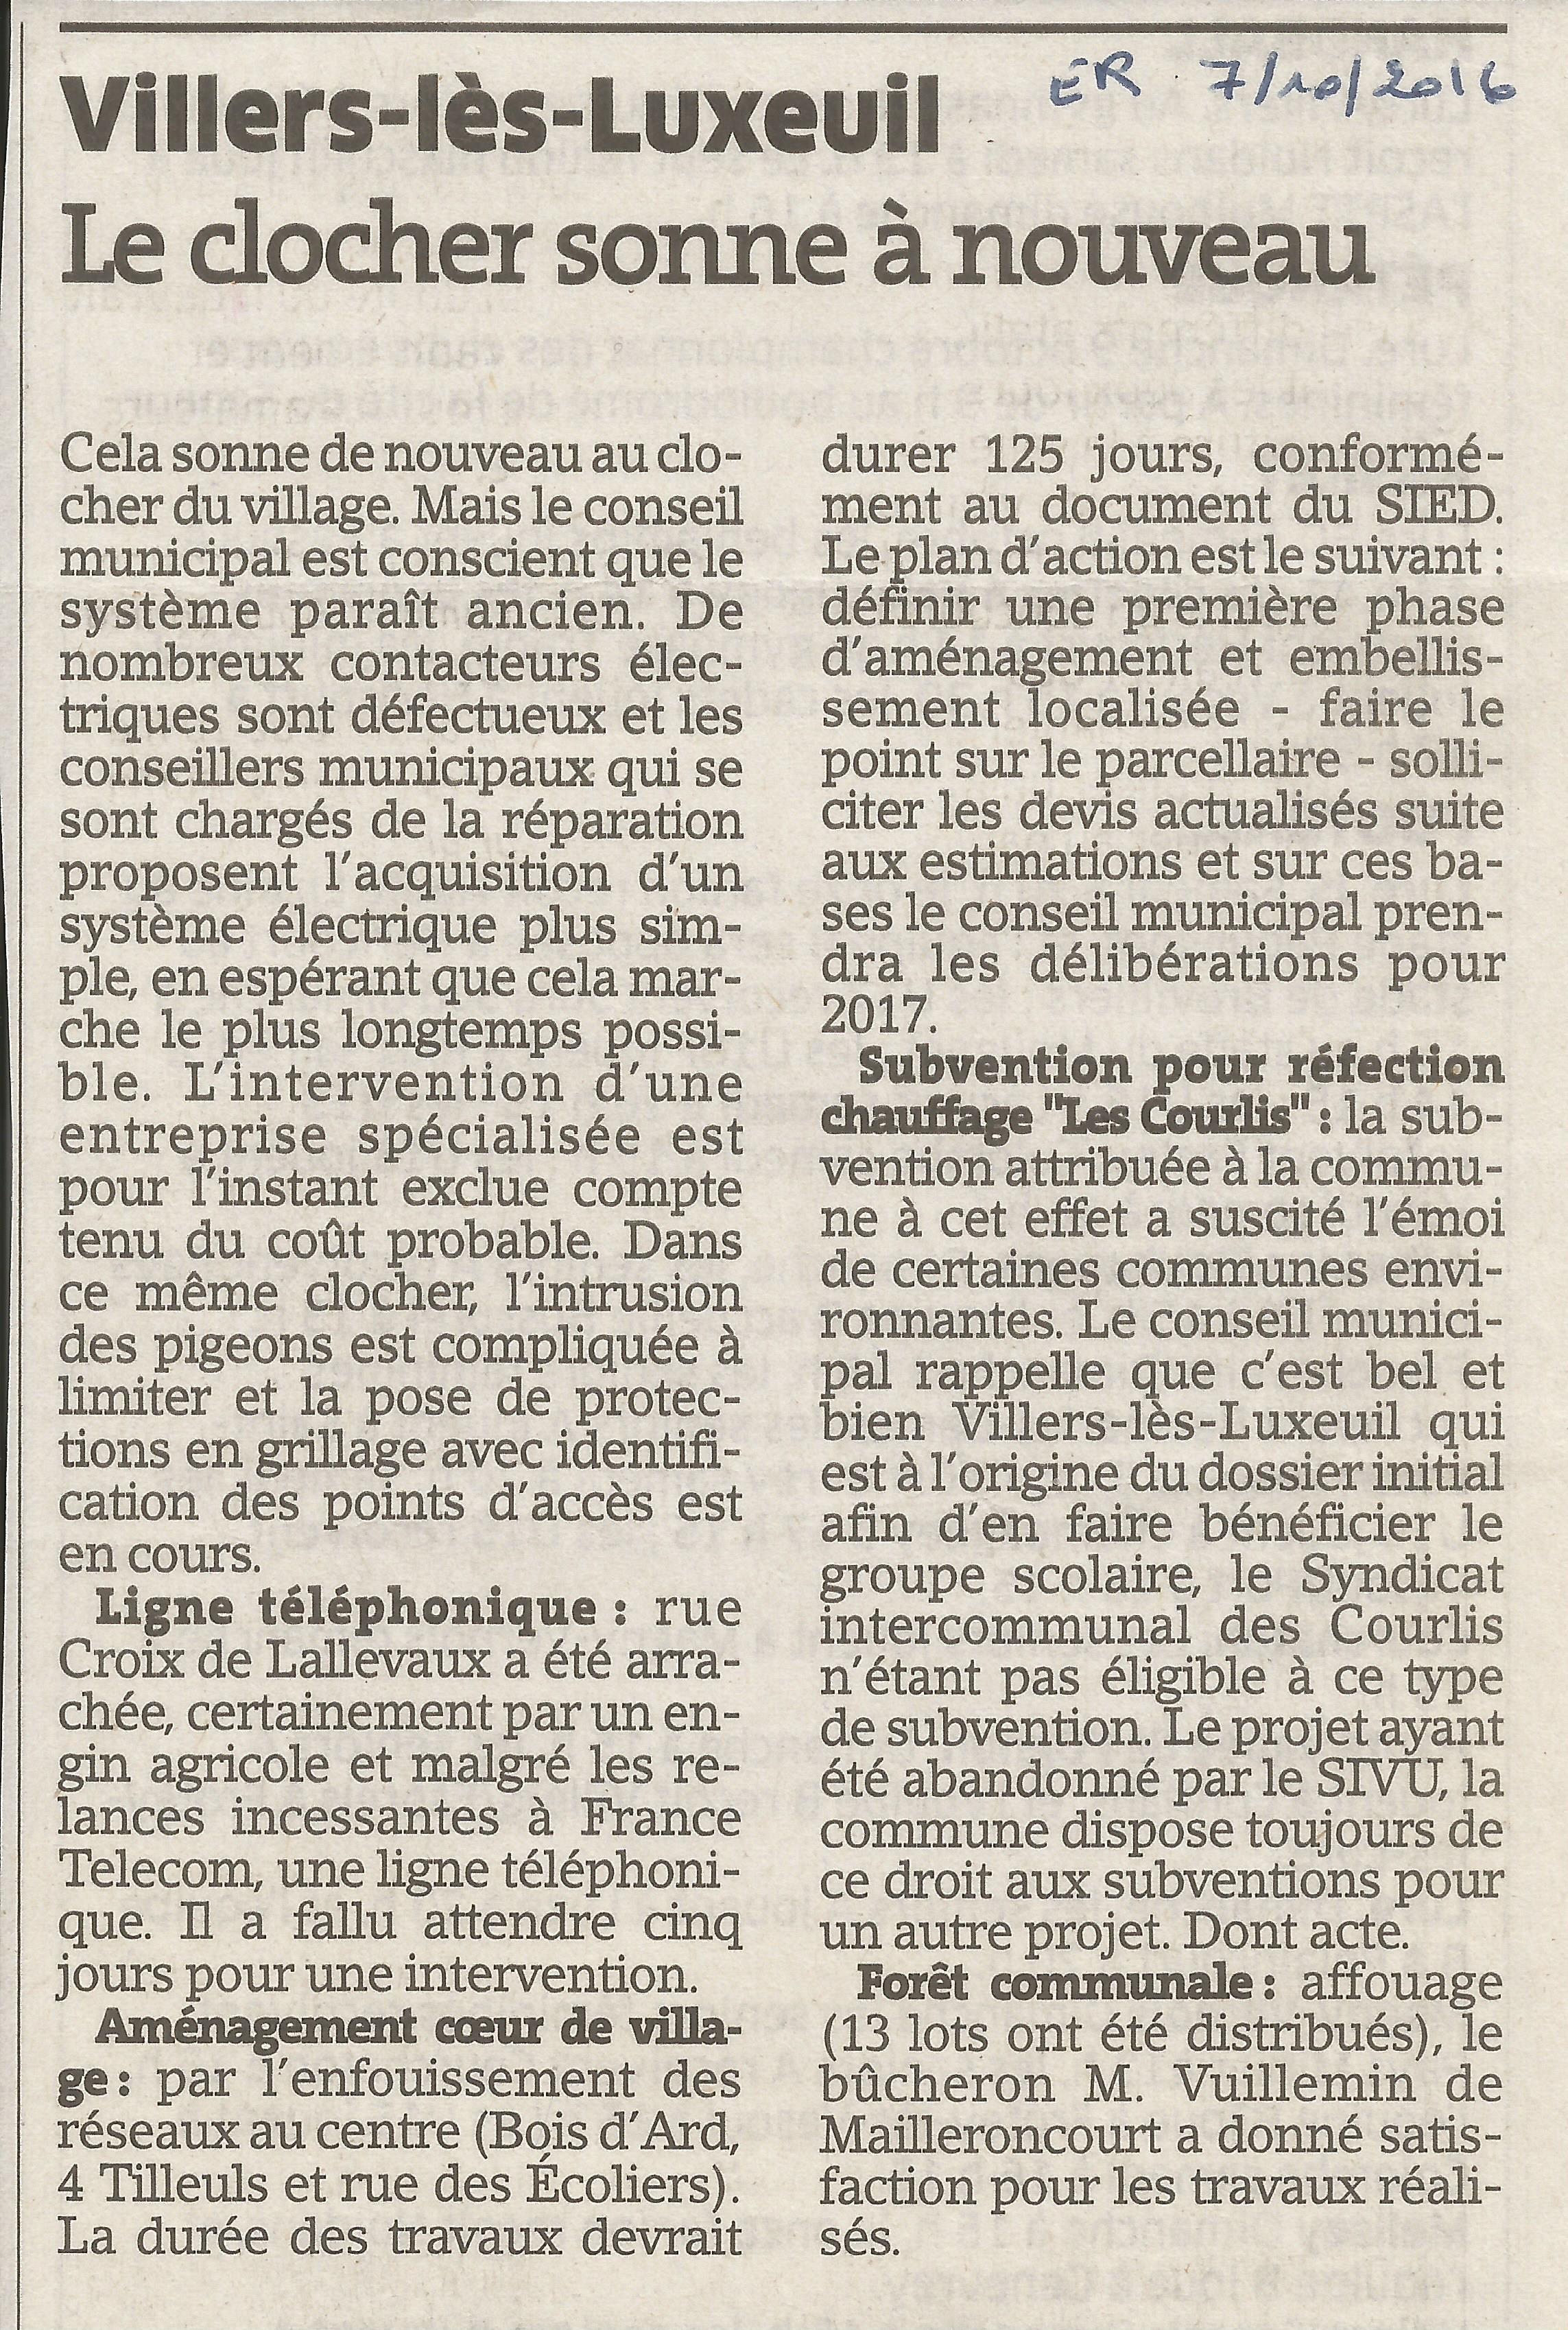 https://www.villers-les-luxeuil.com/projets/villers/files/images/2016_Mairie/Presse/2016_10_07.jpg